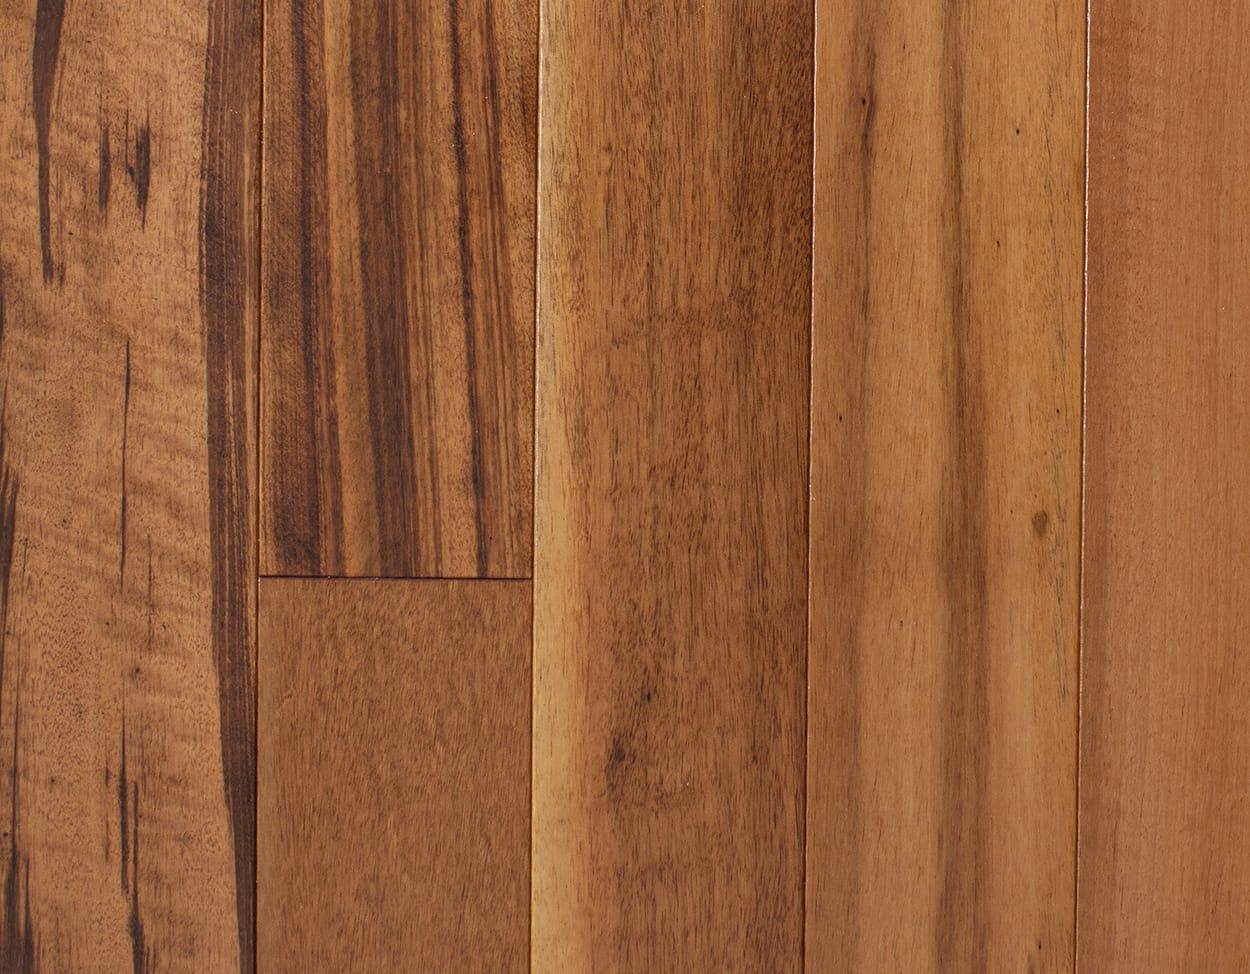 Mullican Meadow Brooke 3 Tigerwood Natural Hardwood Flooring